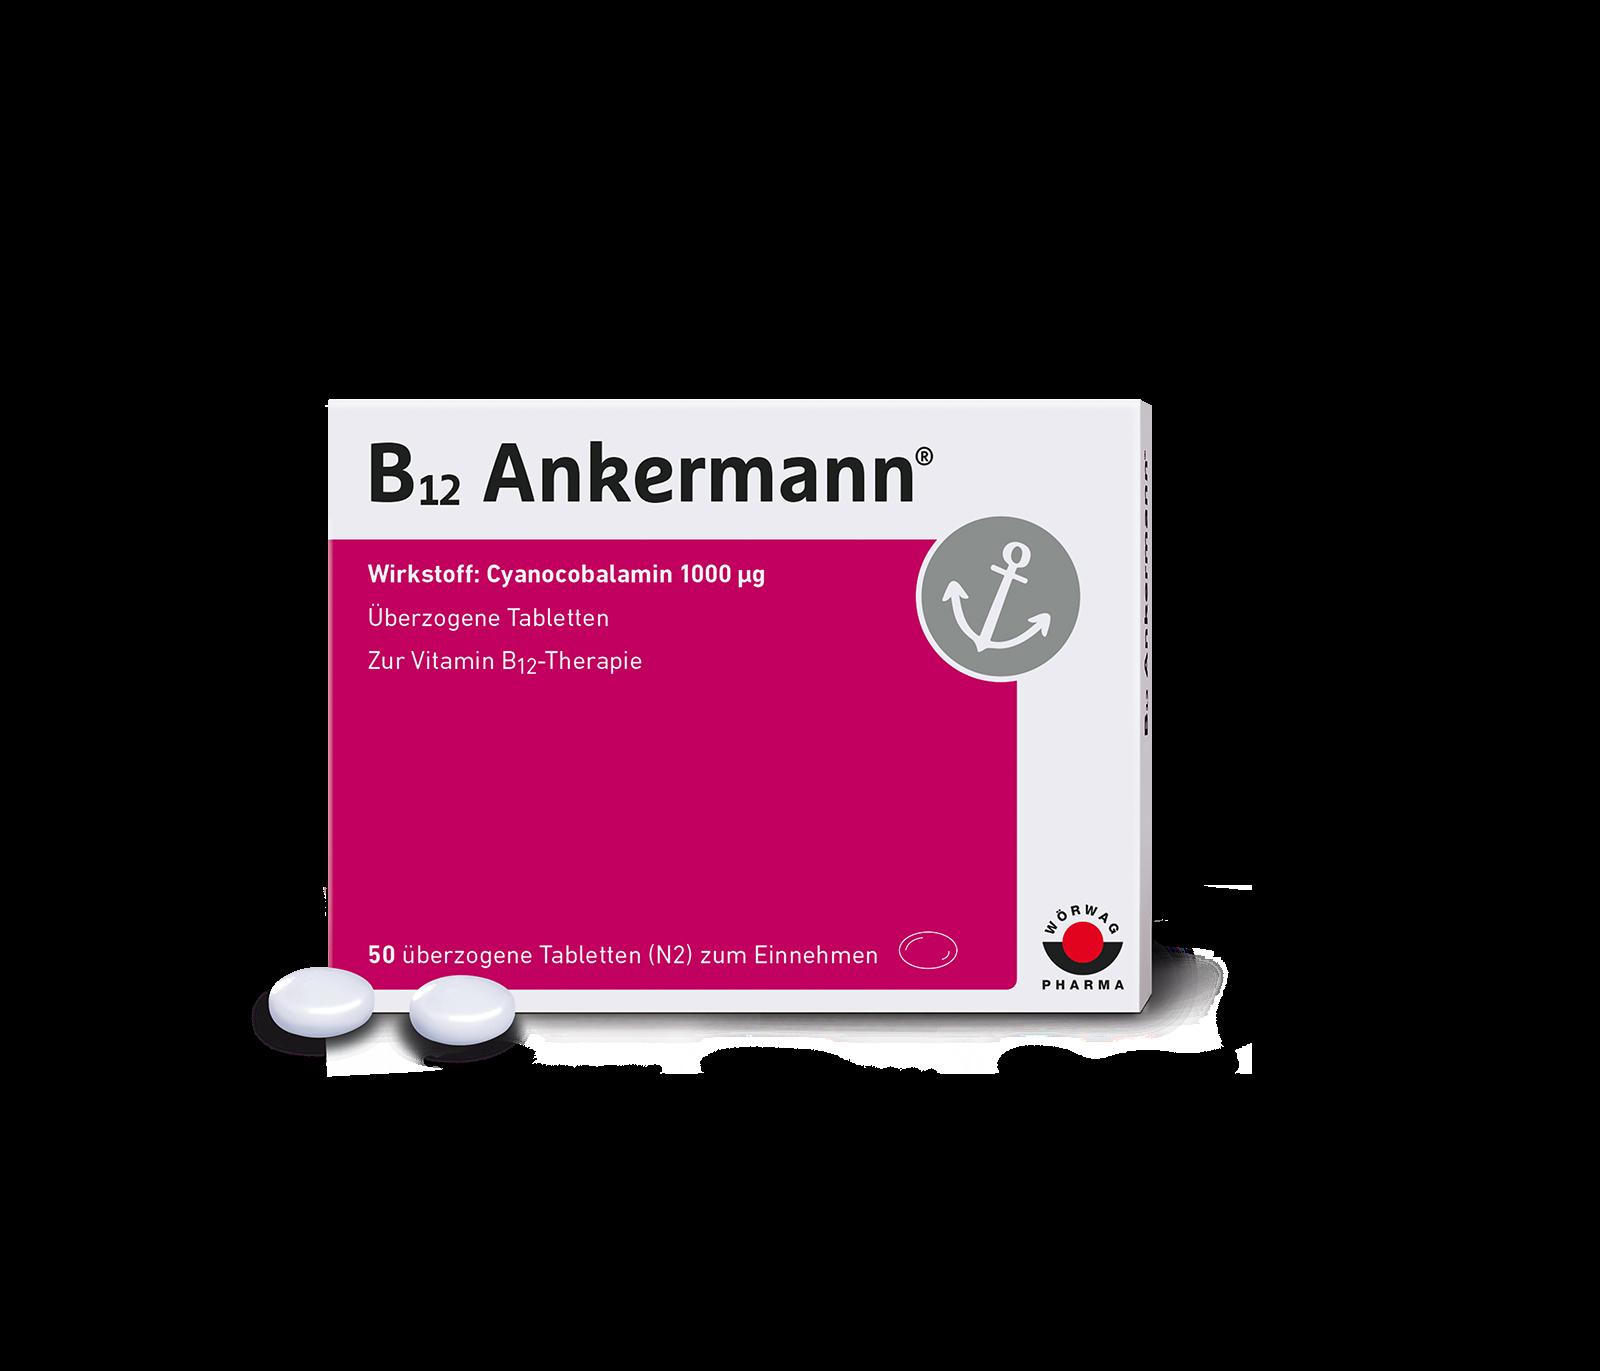 B12 Ankermann® Tabletten bei Vitamin B12-Mangel.